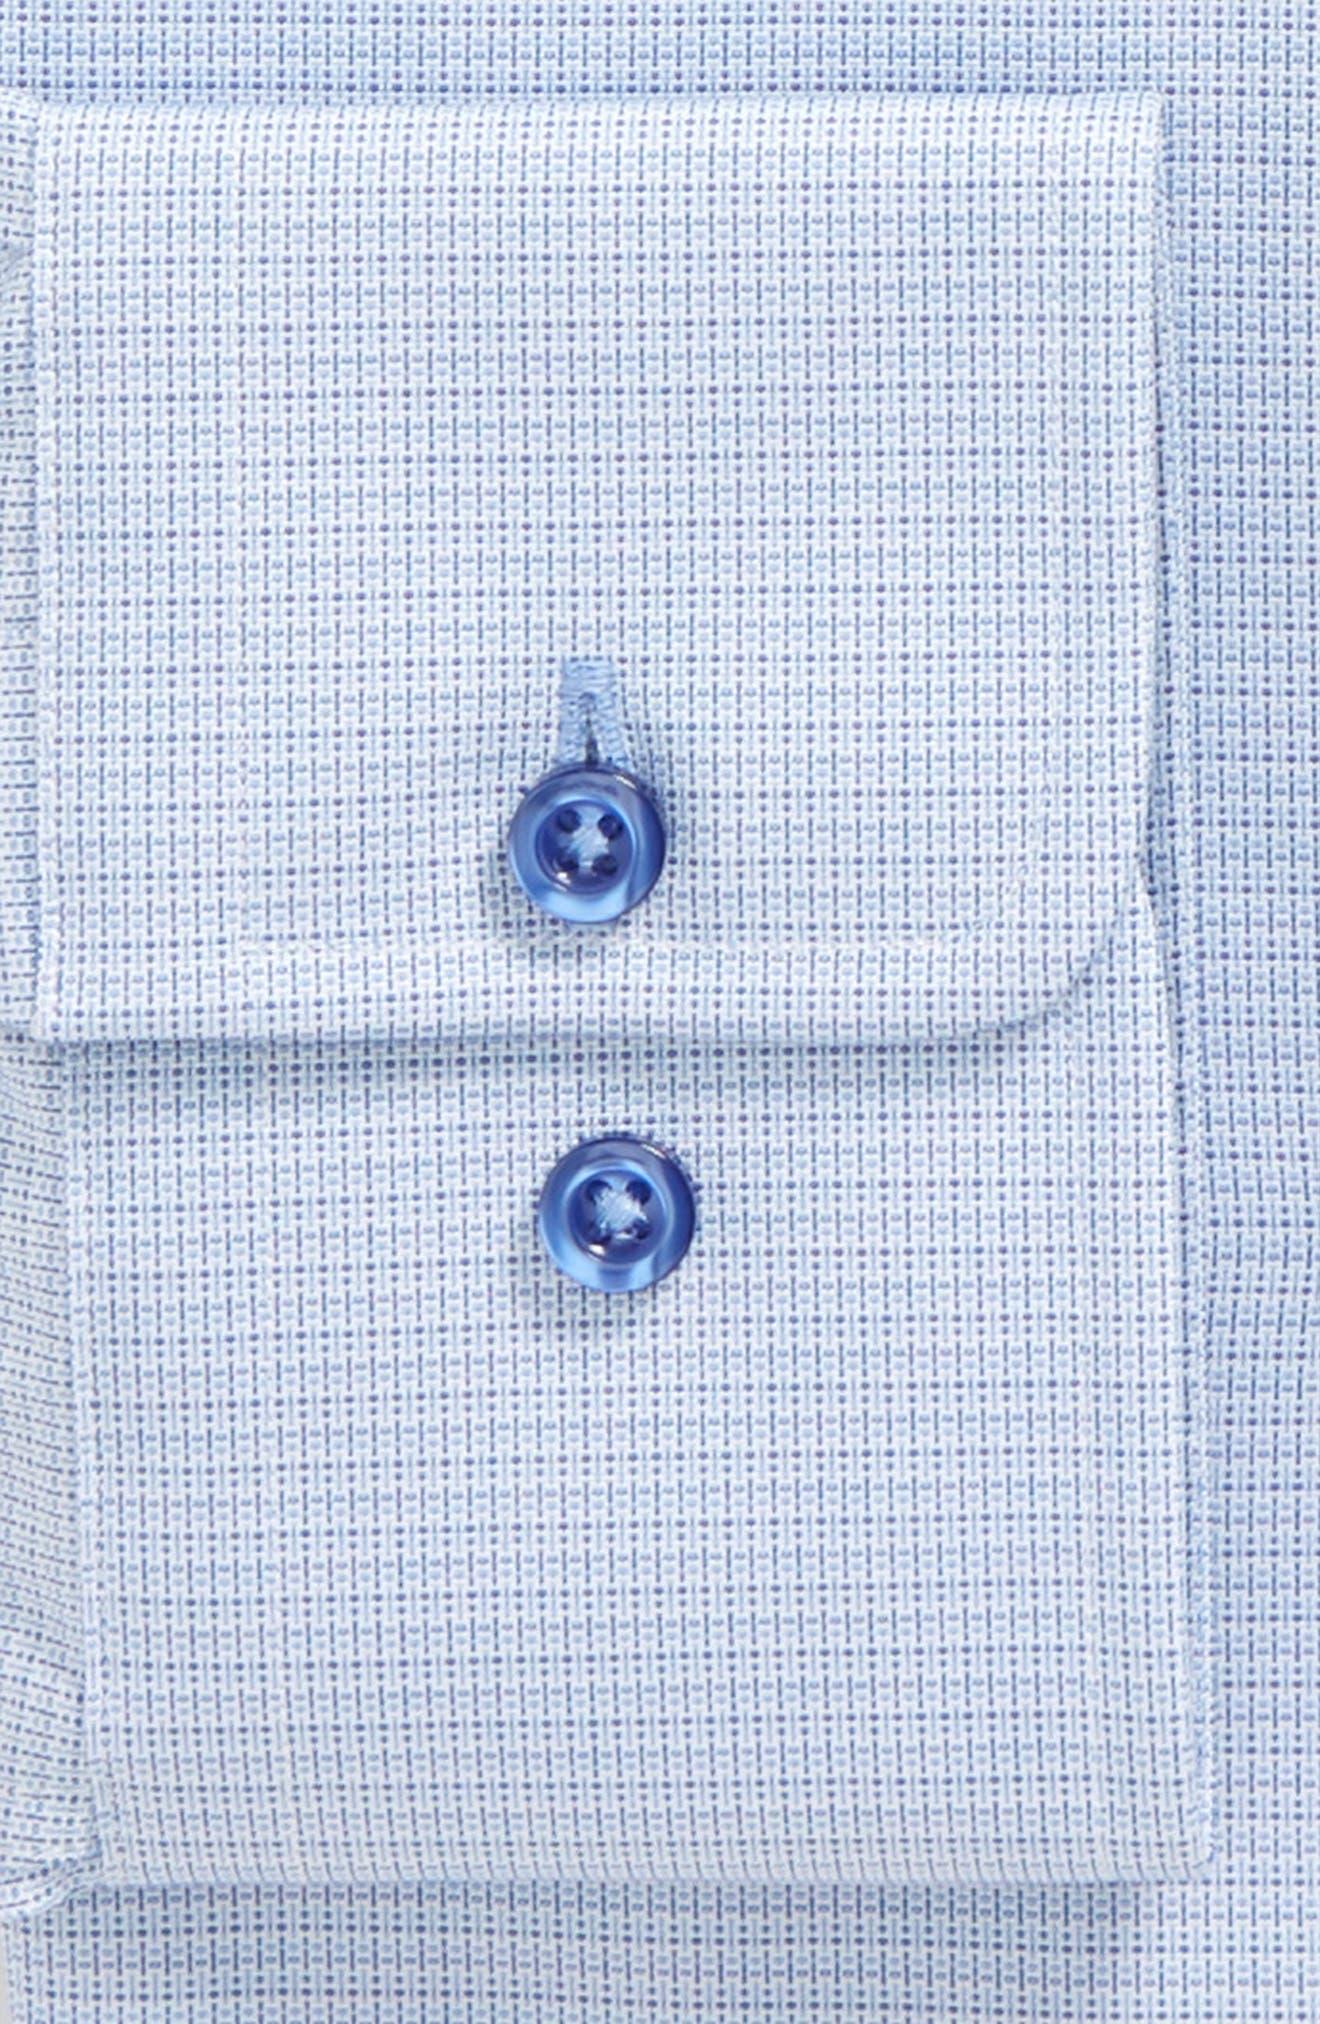 Regular Fit Solid Dress Shirt,                             Alternate thumbnail 6, color,                             423